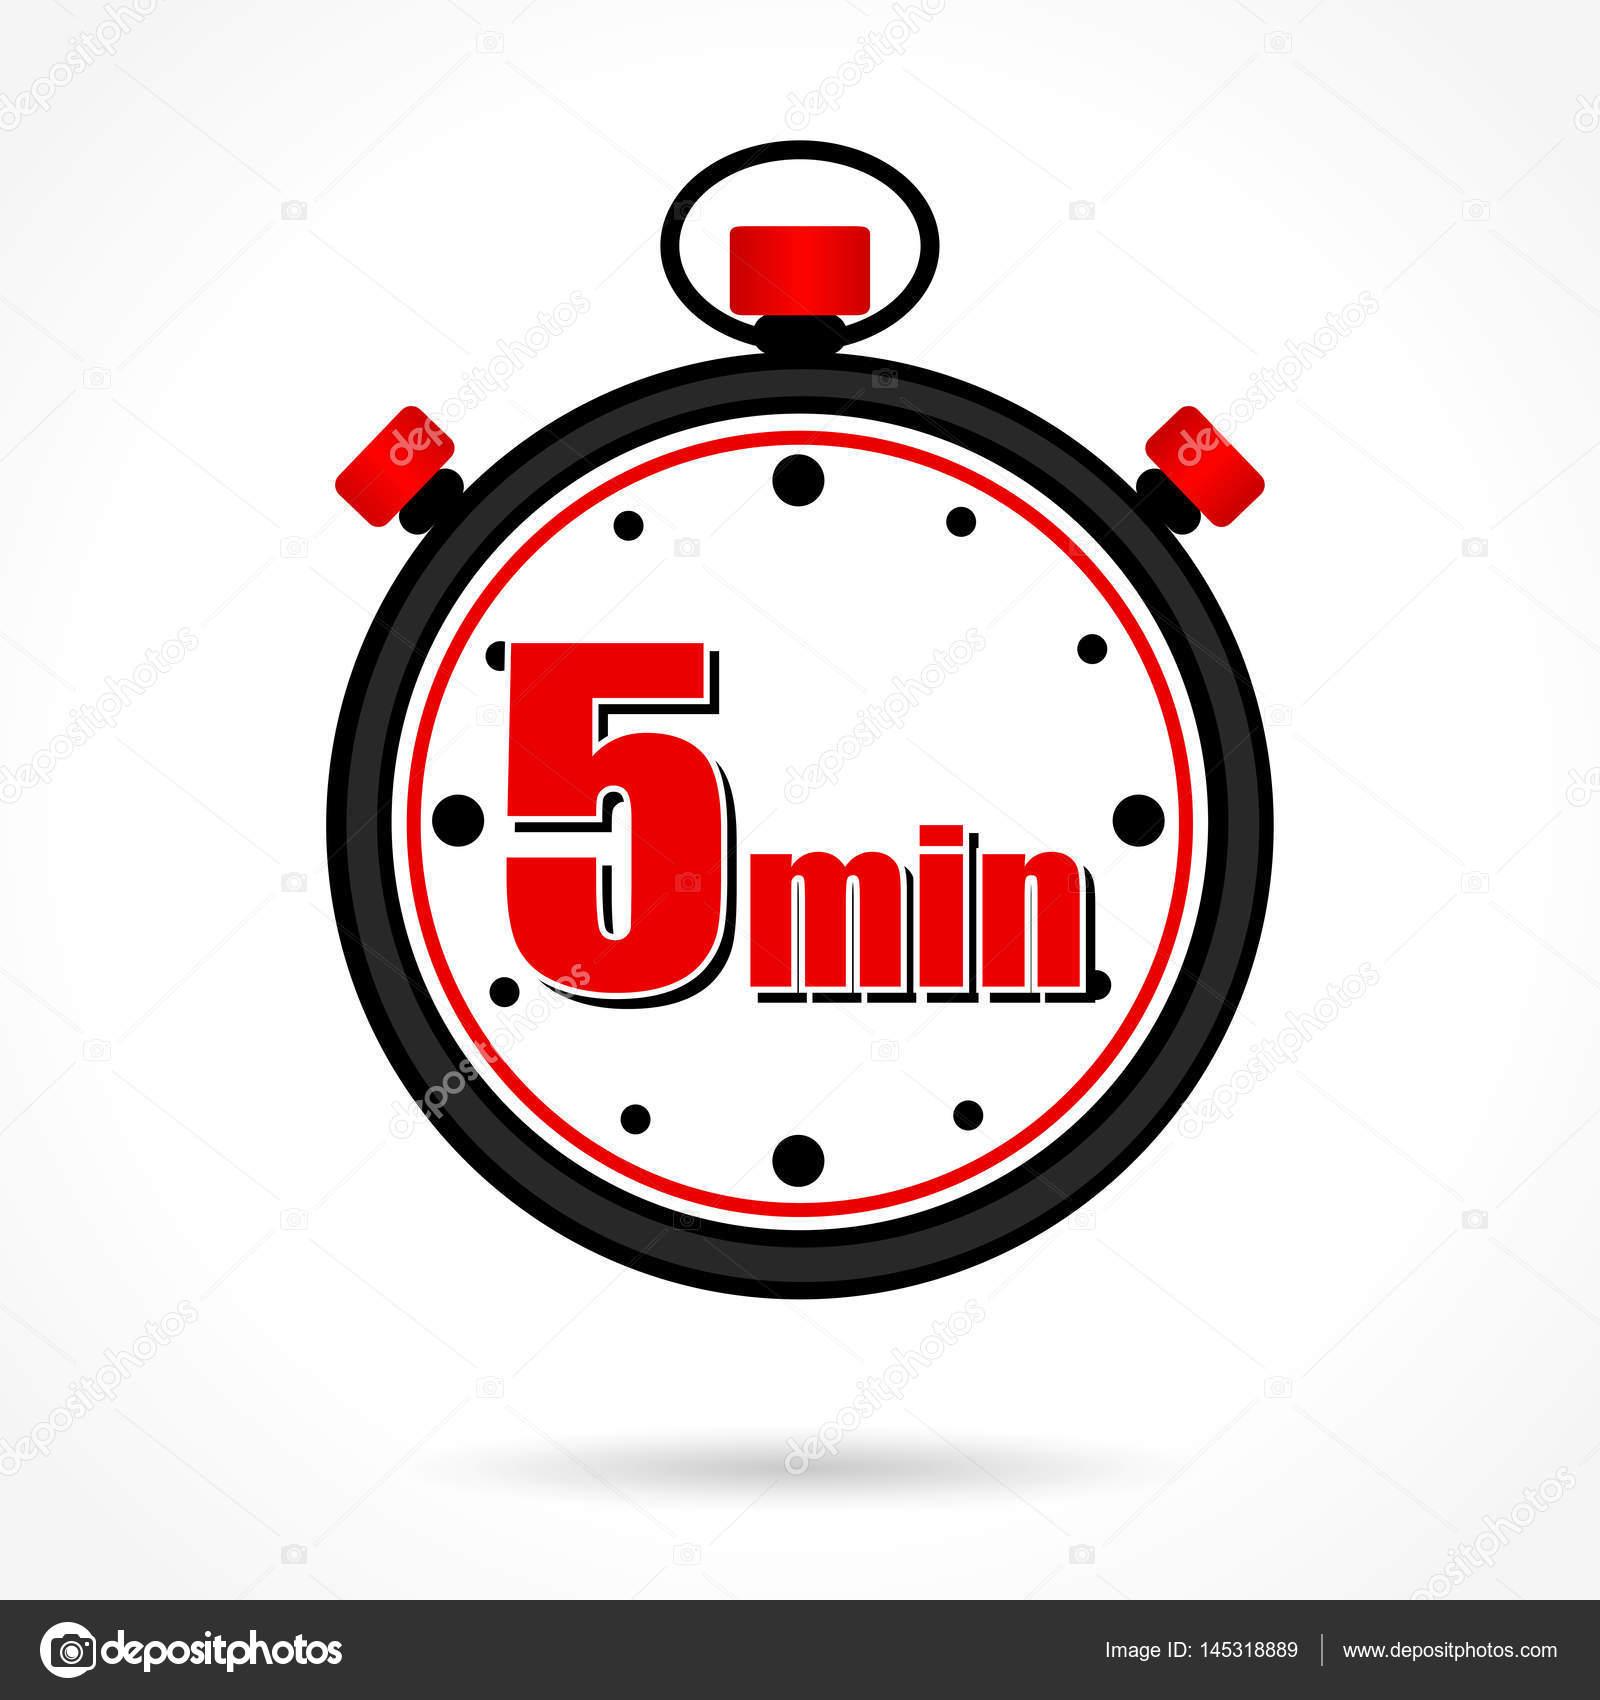 Cron Metro De 5 Minutos Vetores De Stock Nickylarson